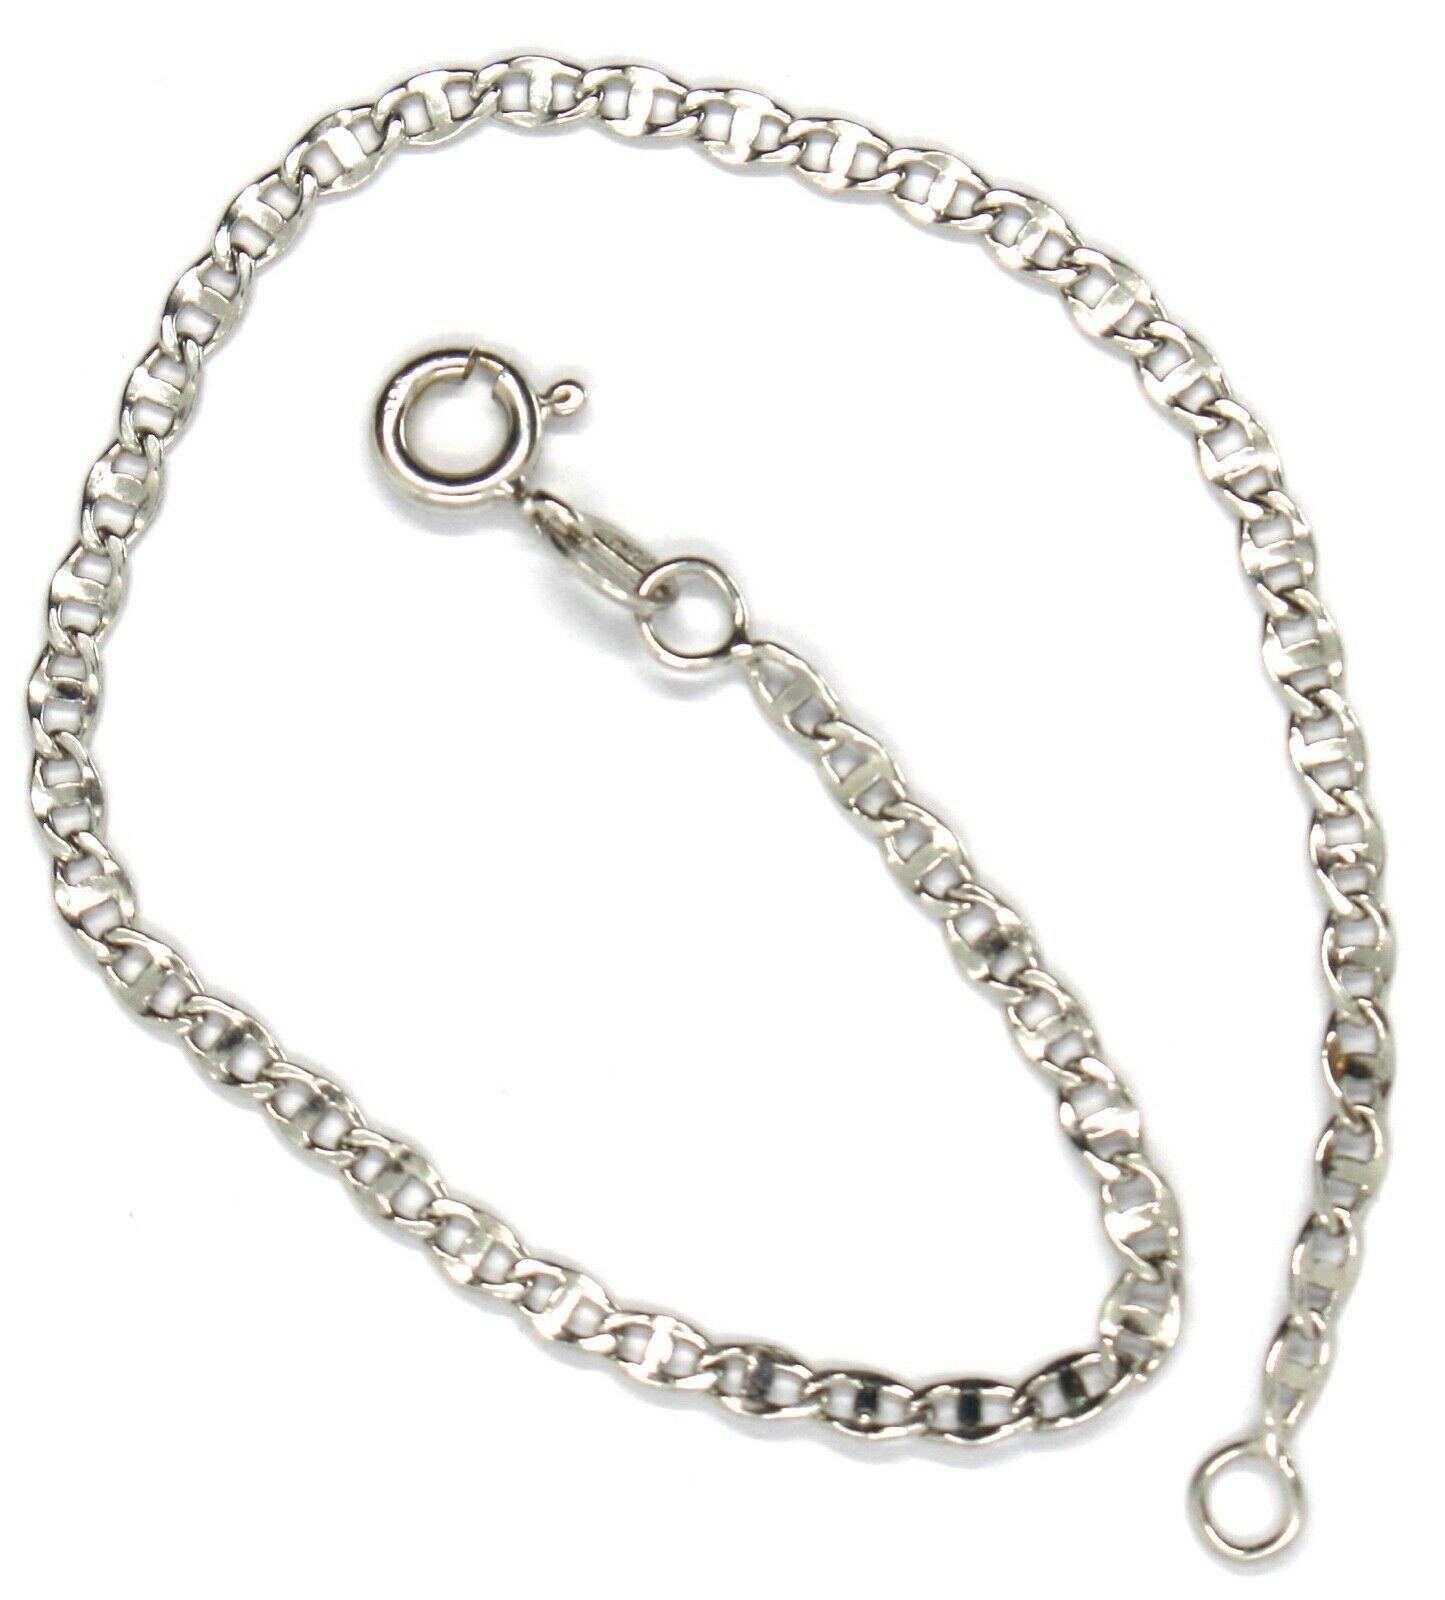 Bracelet White Gold 18K 750,Jersey Marina,Marinara,Crosspiece Flat, 2.8 MM